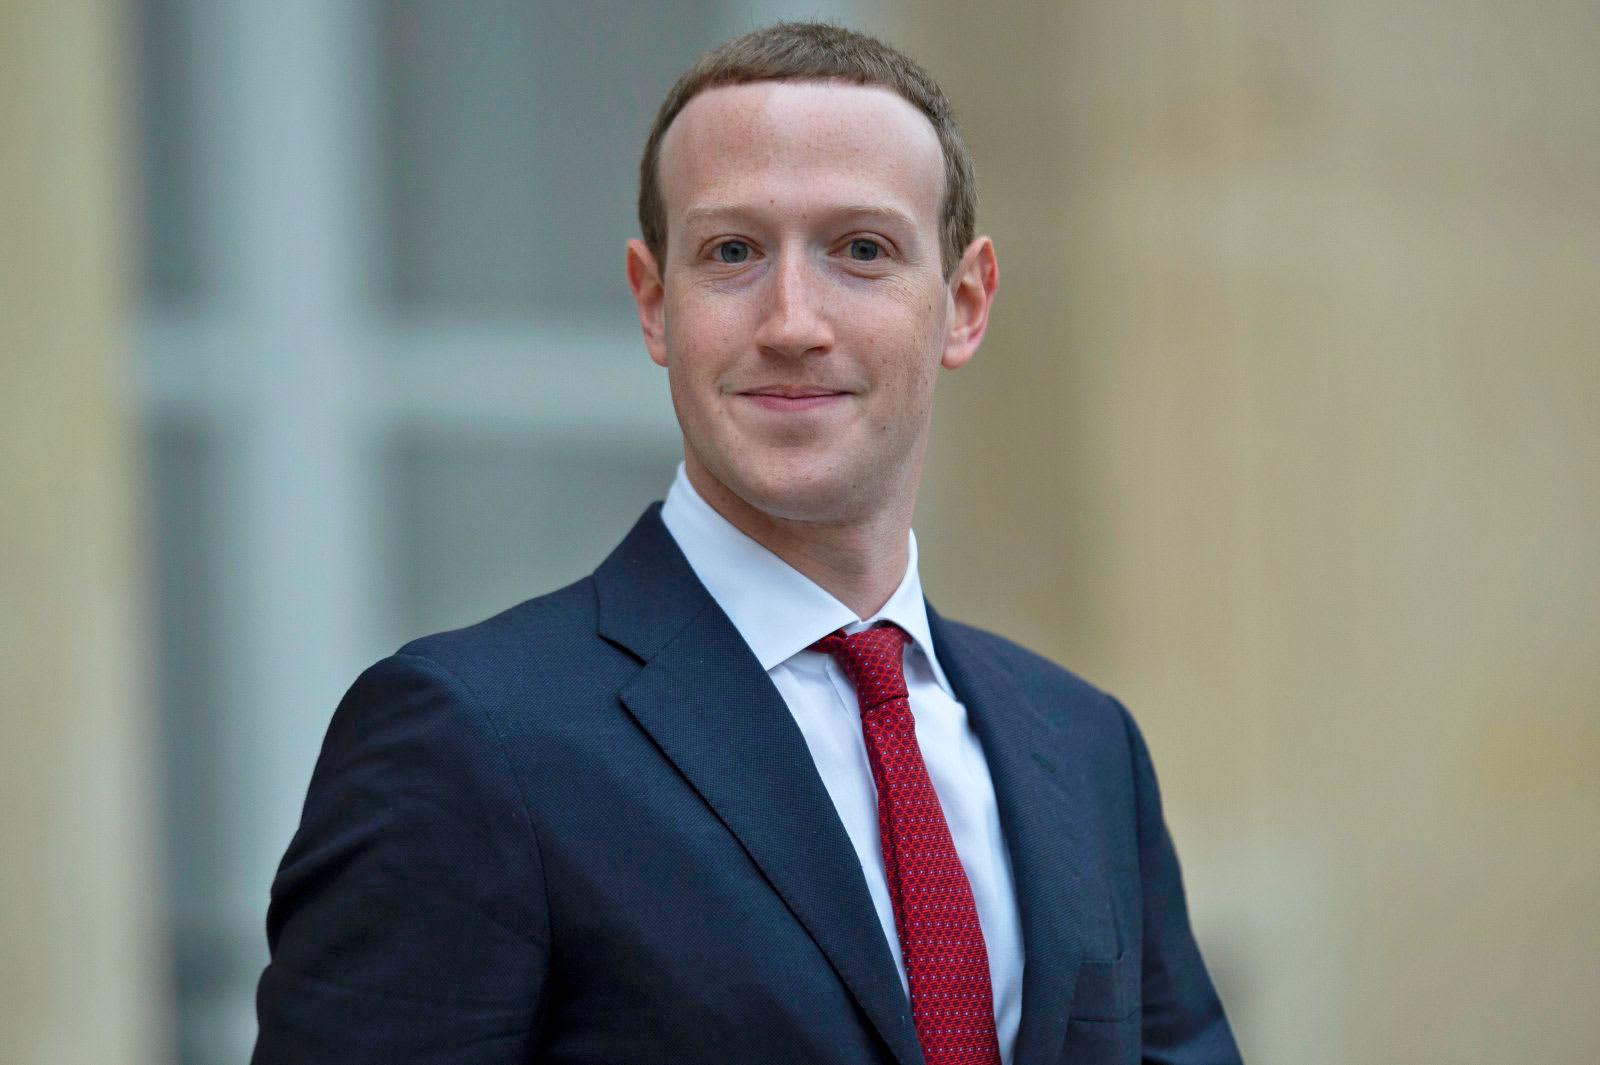 Facebook will pay $5 billion fine for Cambridge Analytica